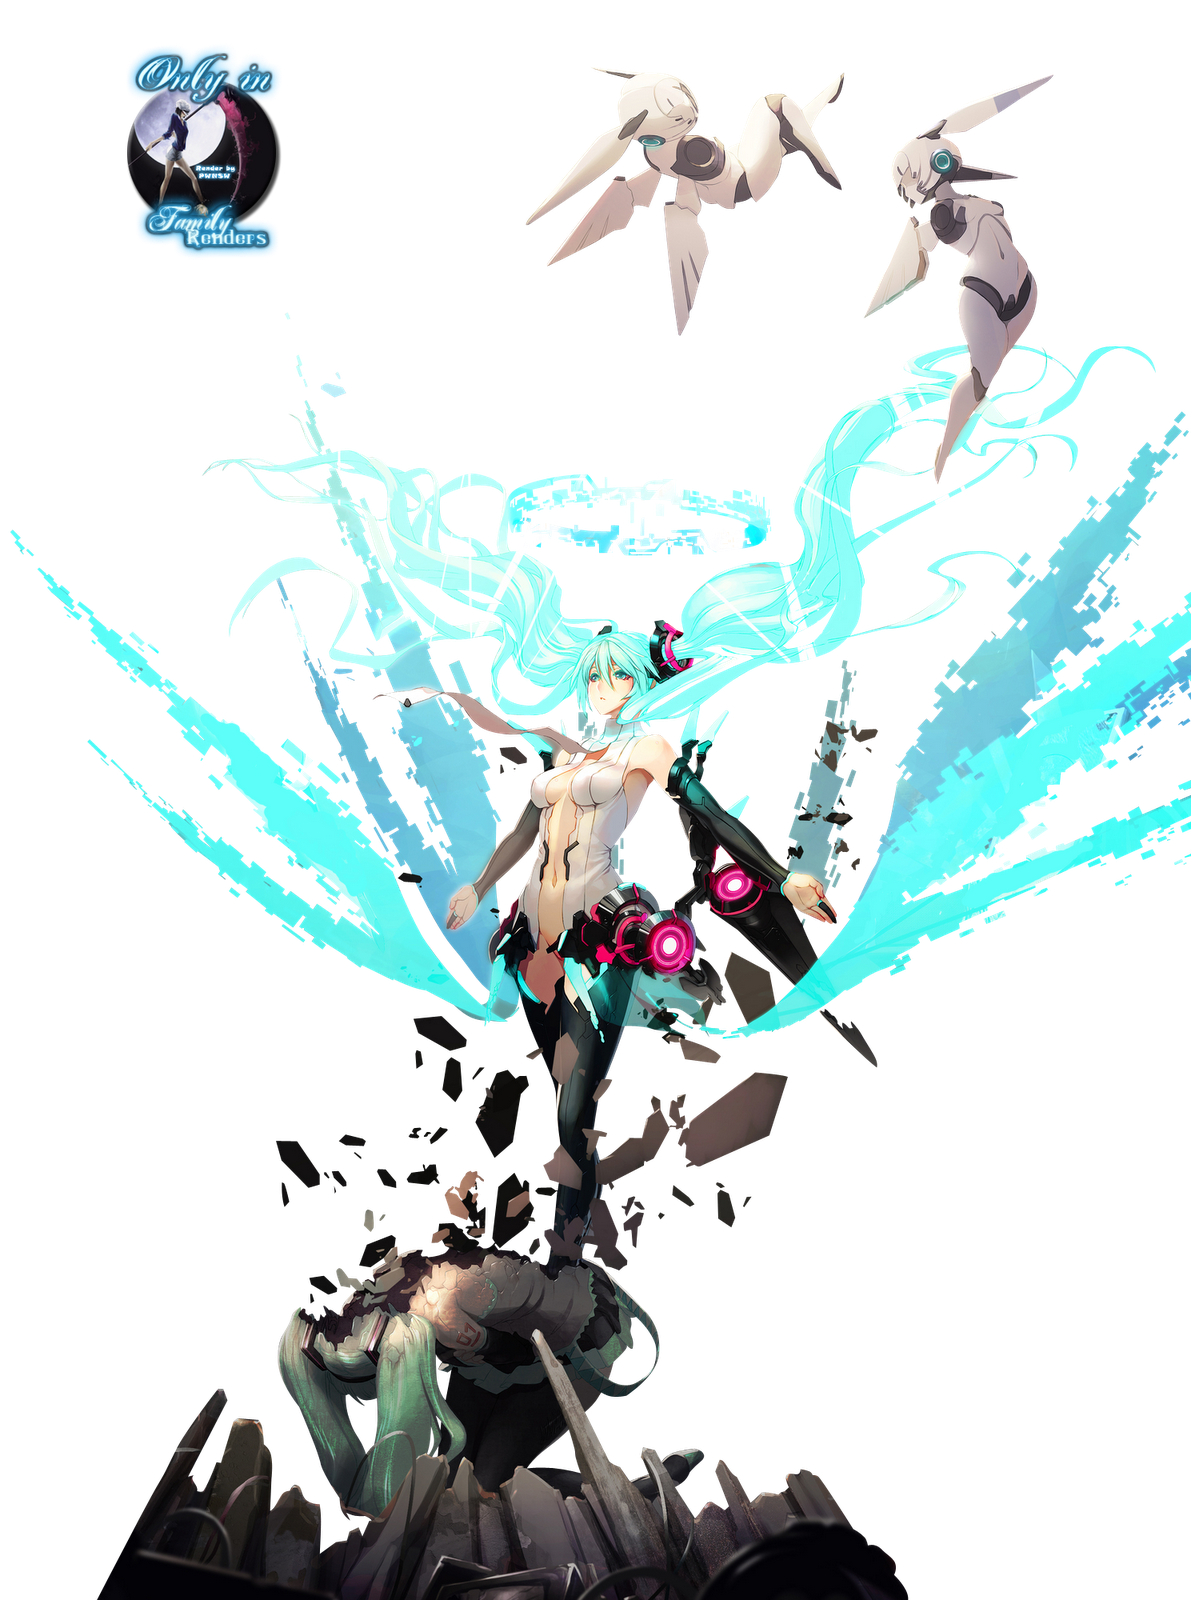 PNG-Miku Hatsune Append